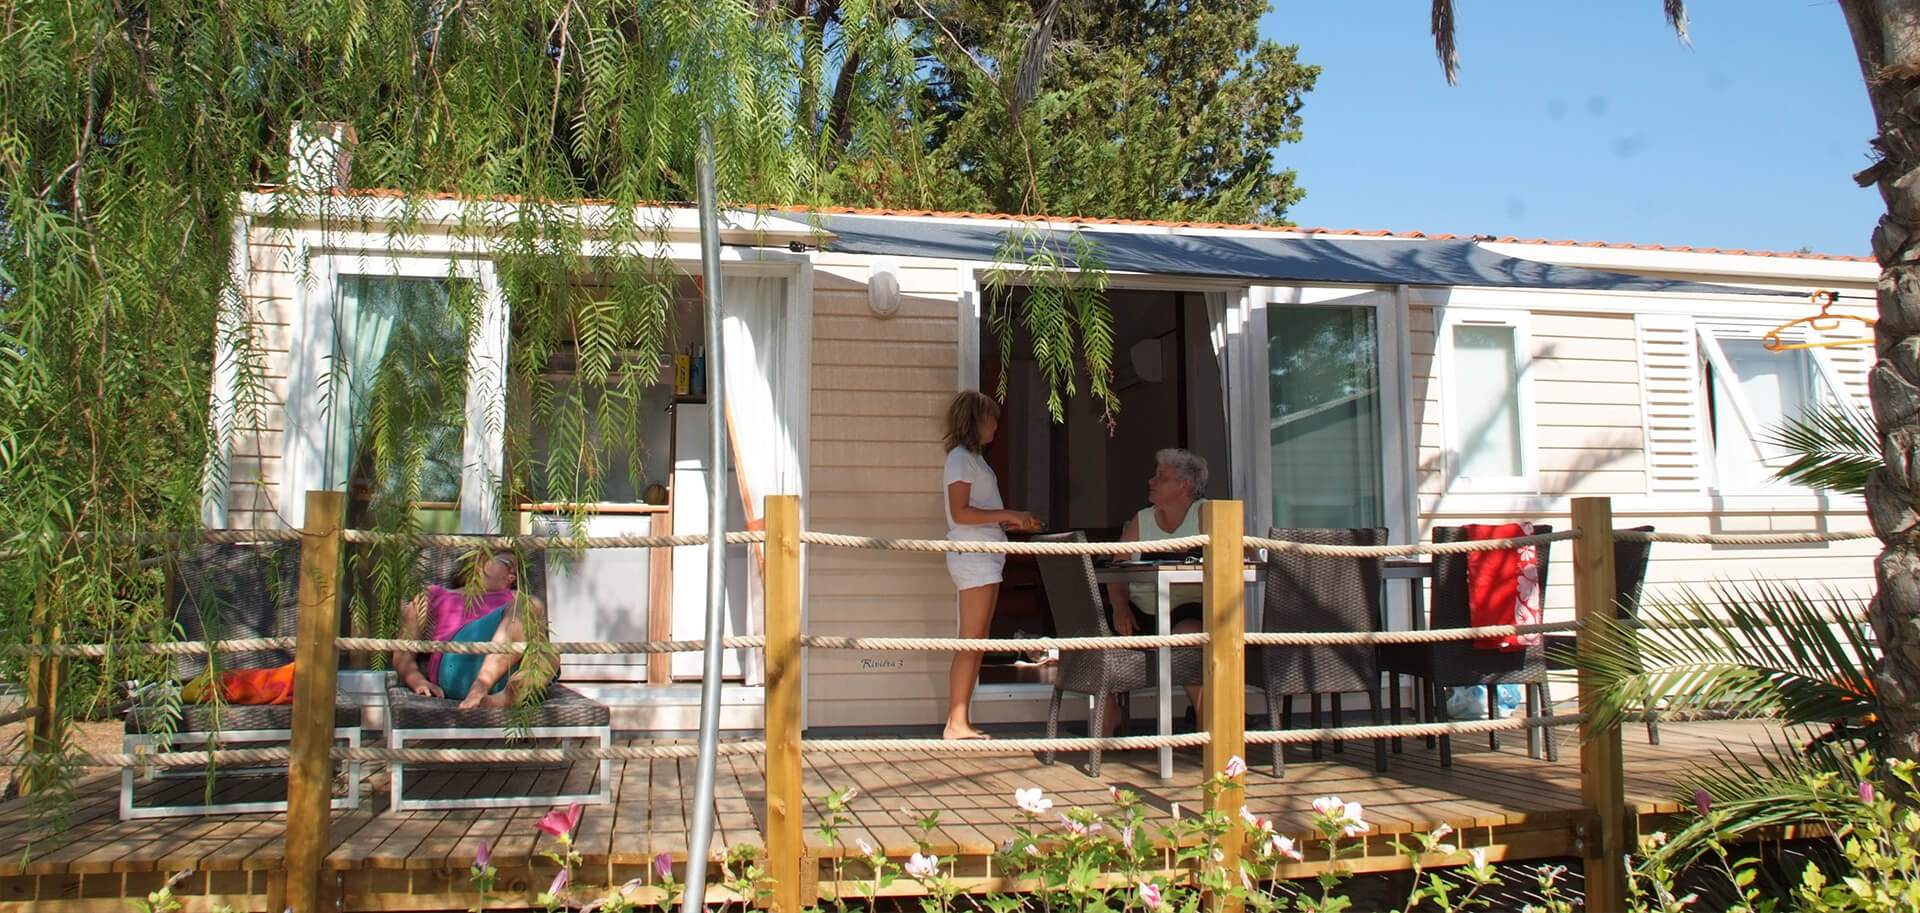 location mobil home prestige dans un camping 5 toiles dans le var. Black Bedroom Furniture Sets. Home Design Ideas